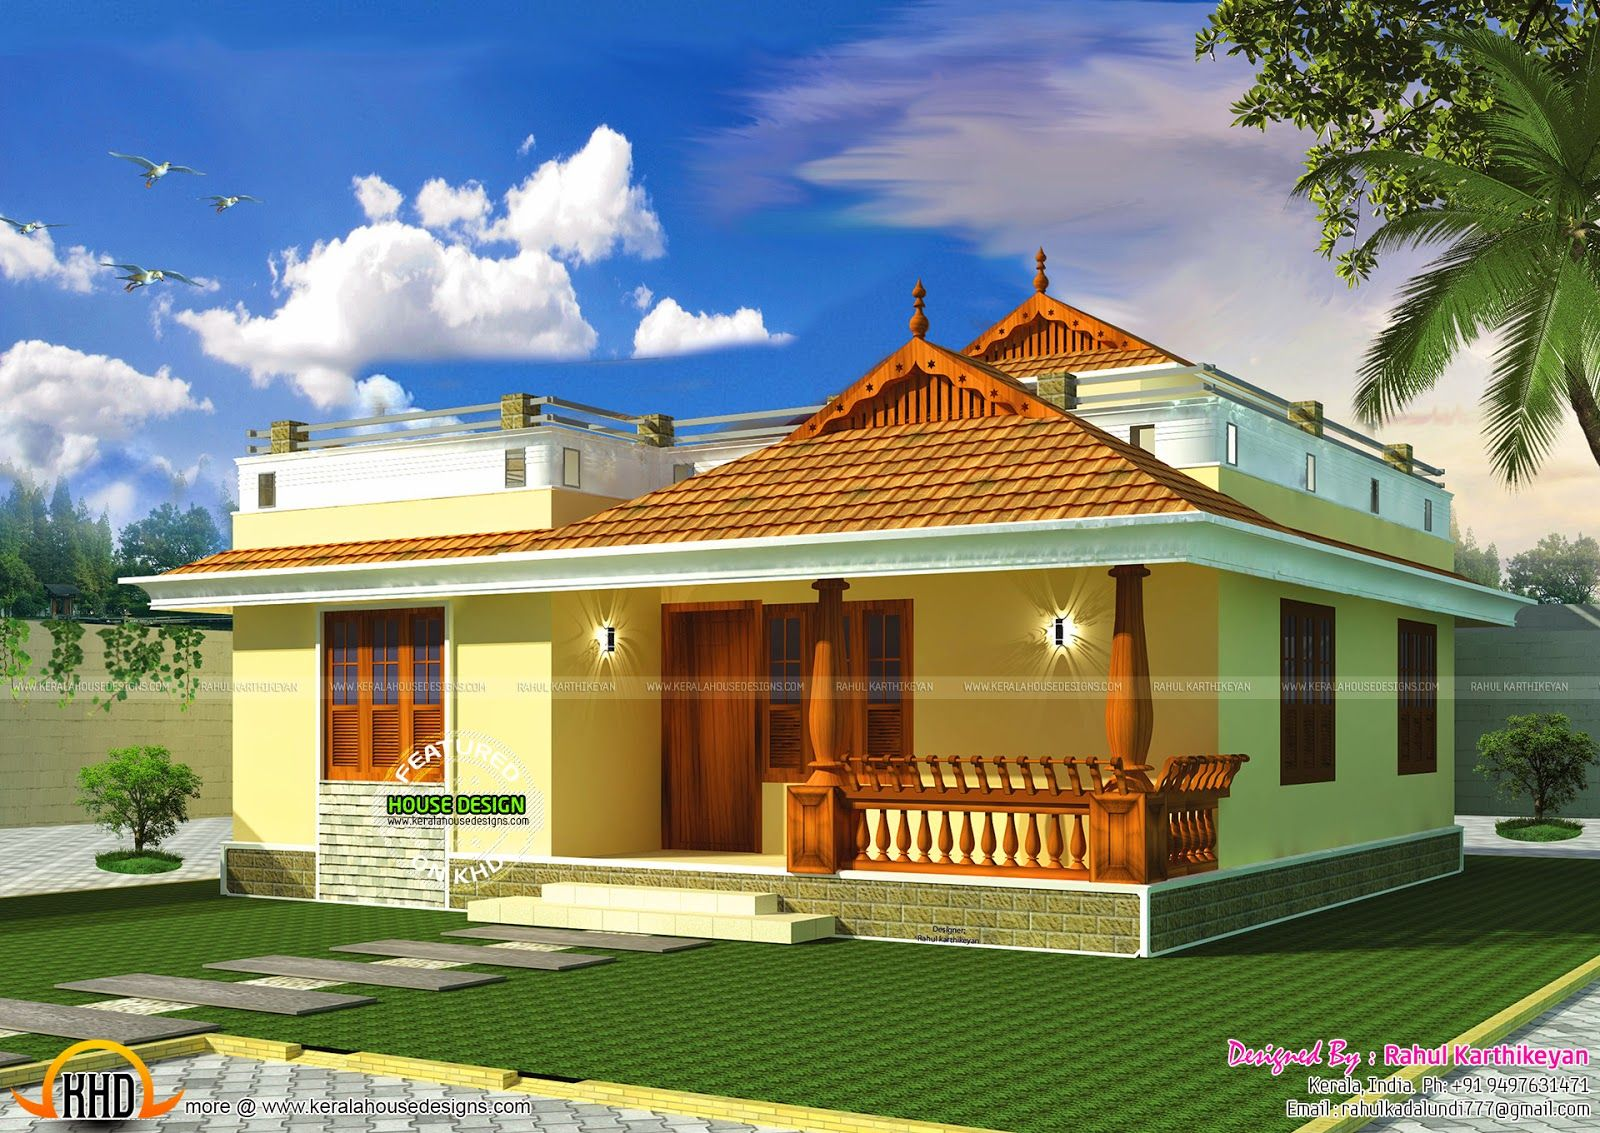 Small Kerala Style Home Kerala House Design Small House Design Kerala Small House Design